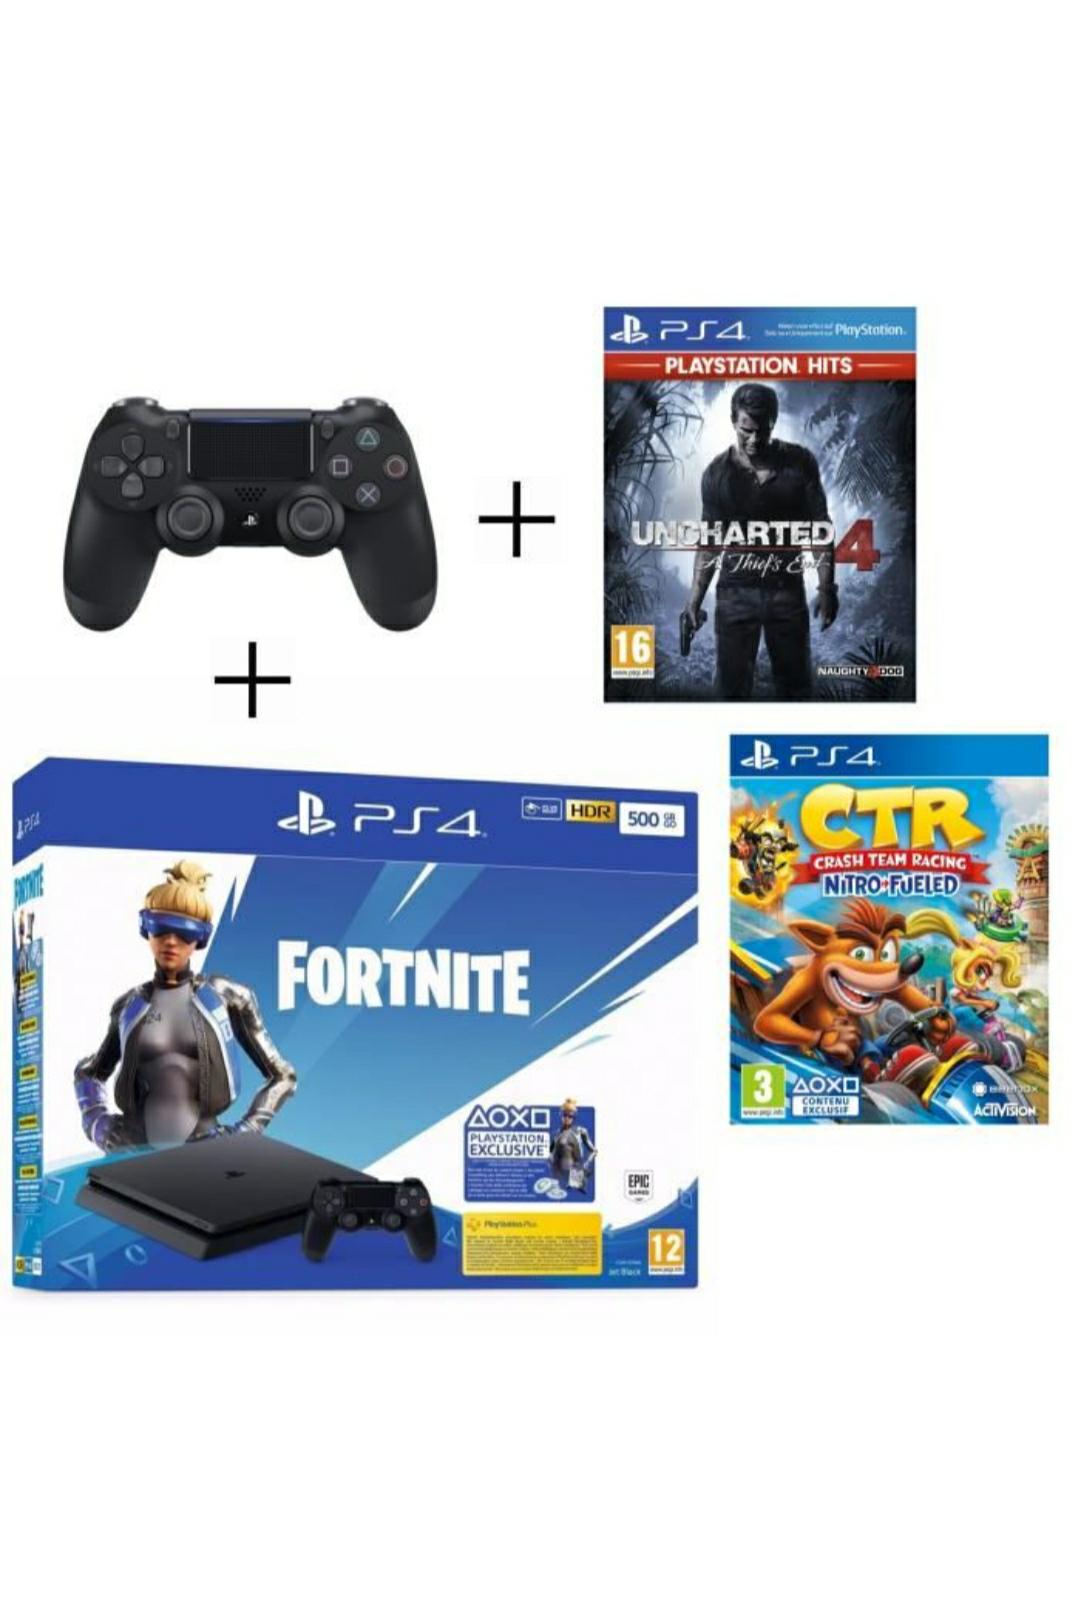 Pack Console PS4 500 Go (Noir) + Manette PS4 DualShock 4 Noire V2 + Voucher Fortnite + Uncharted 4 PSHits + Crash Team Racing Nitro Fueled